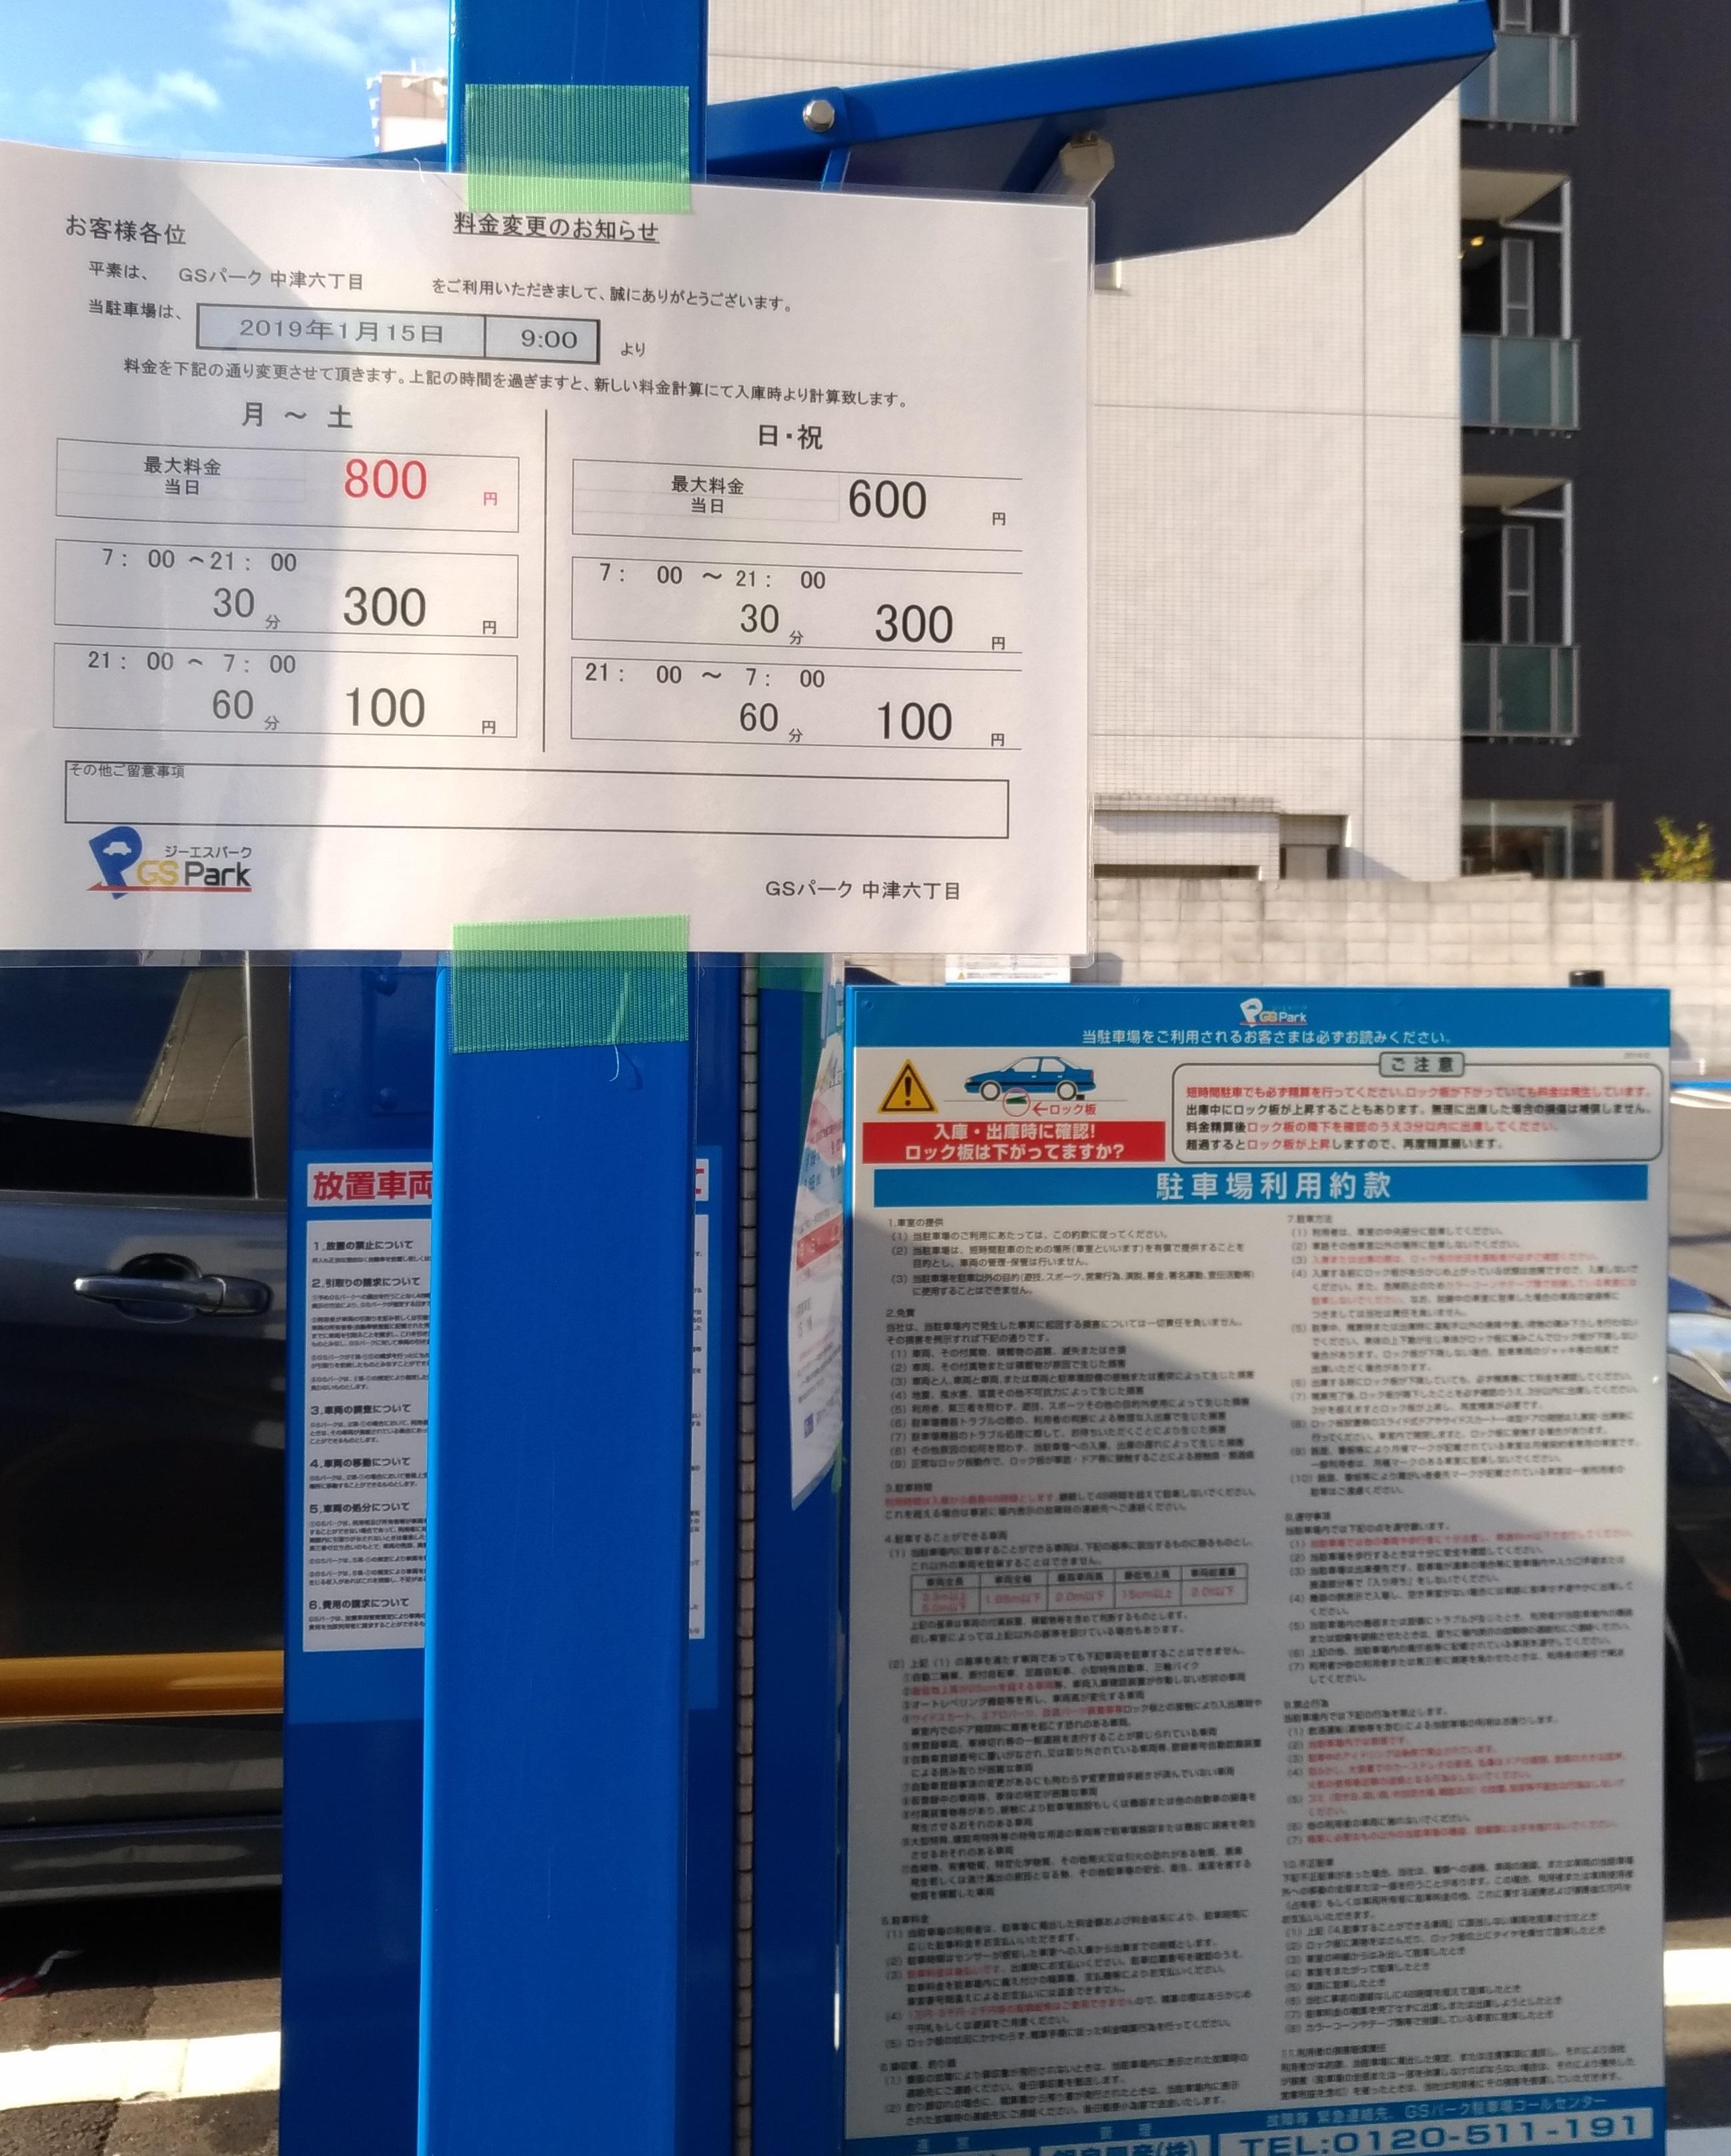 osaka_kitaku_nakatsu6_parking2.jpg